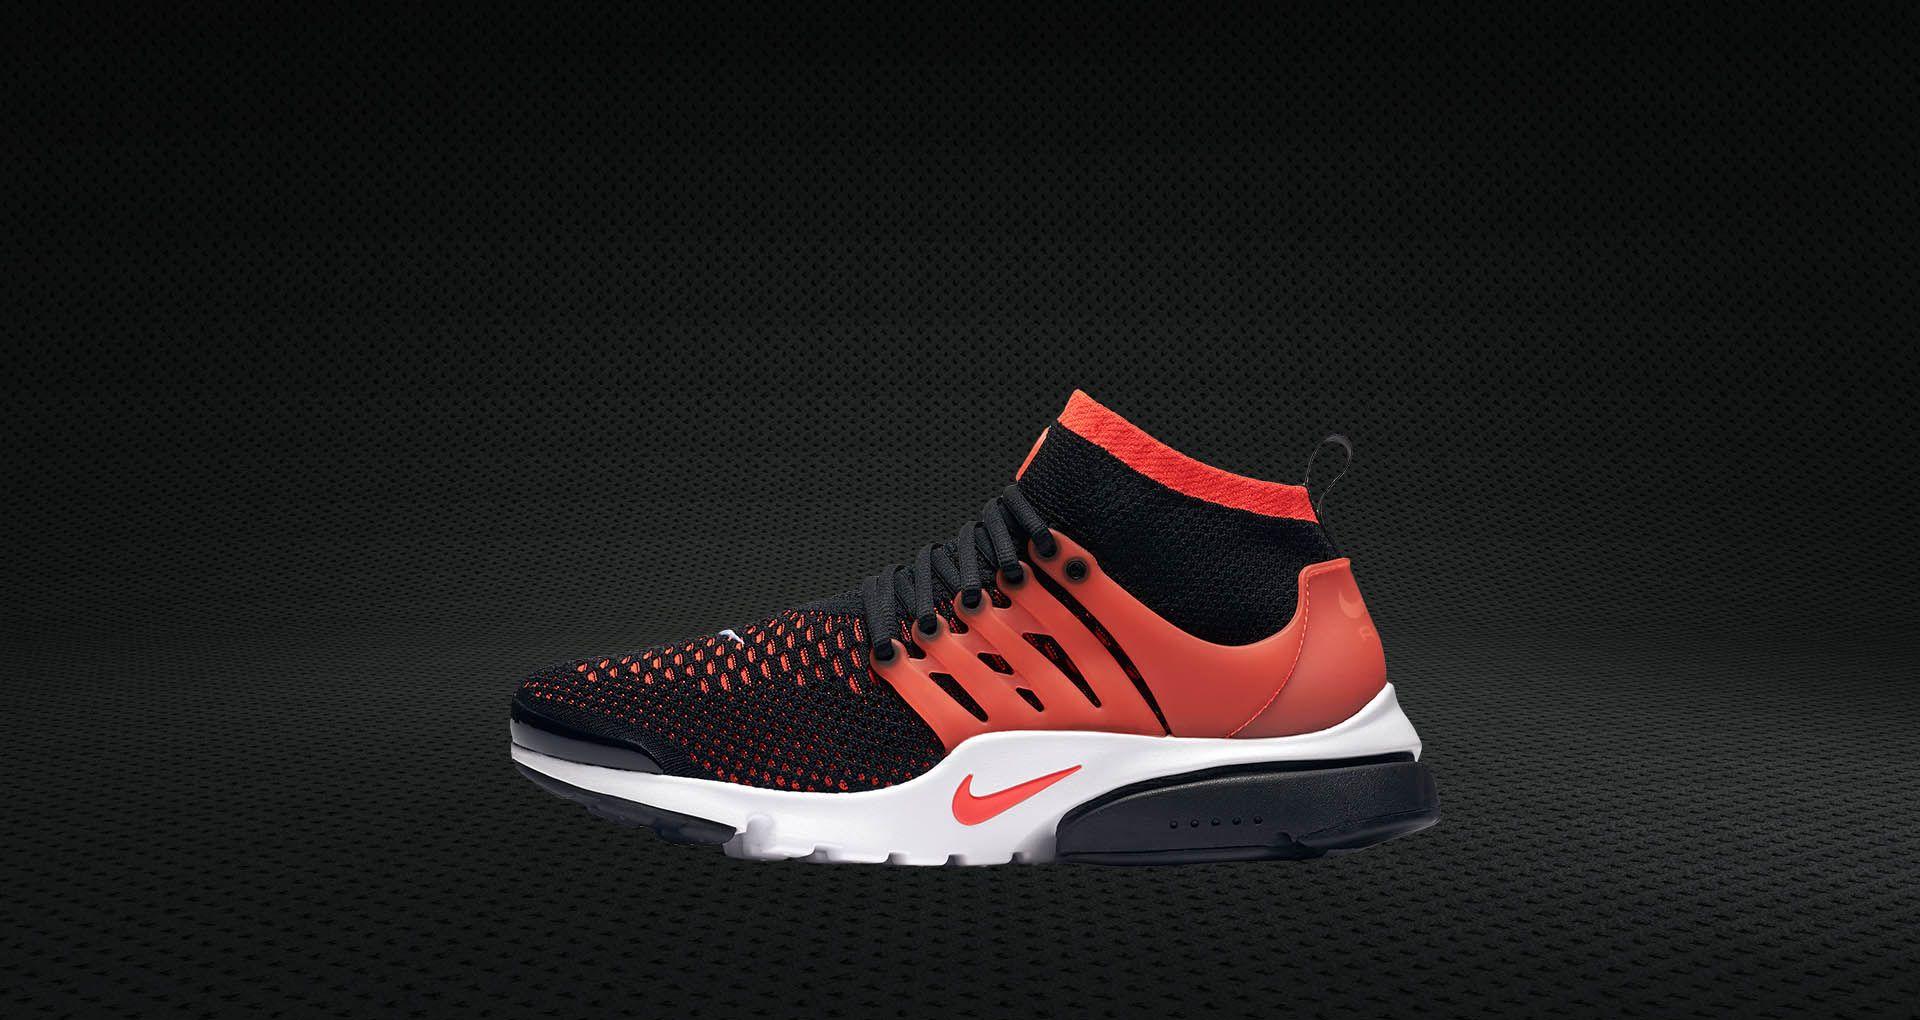 8712ec04273b Nike Air Presto Ultra Flyknit  Bright Crimson  Release Date. Nike+ ...